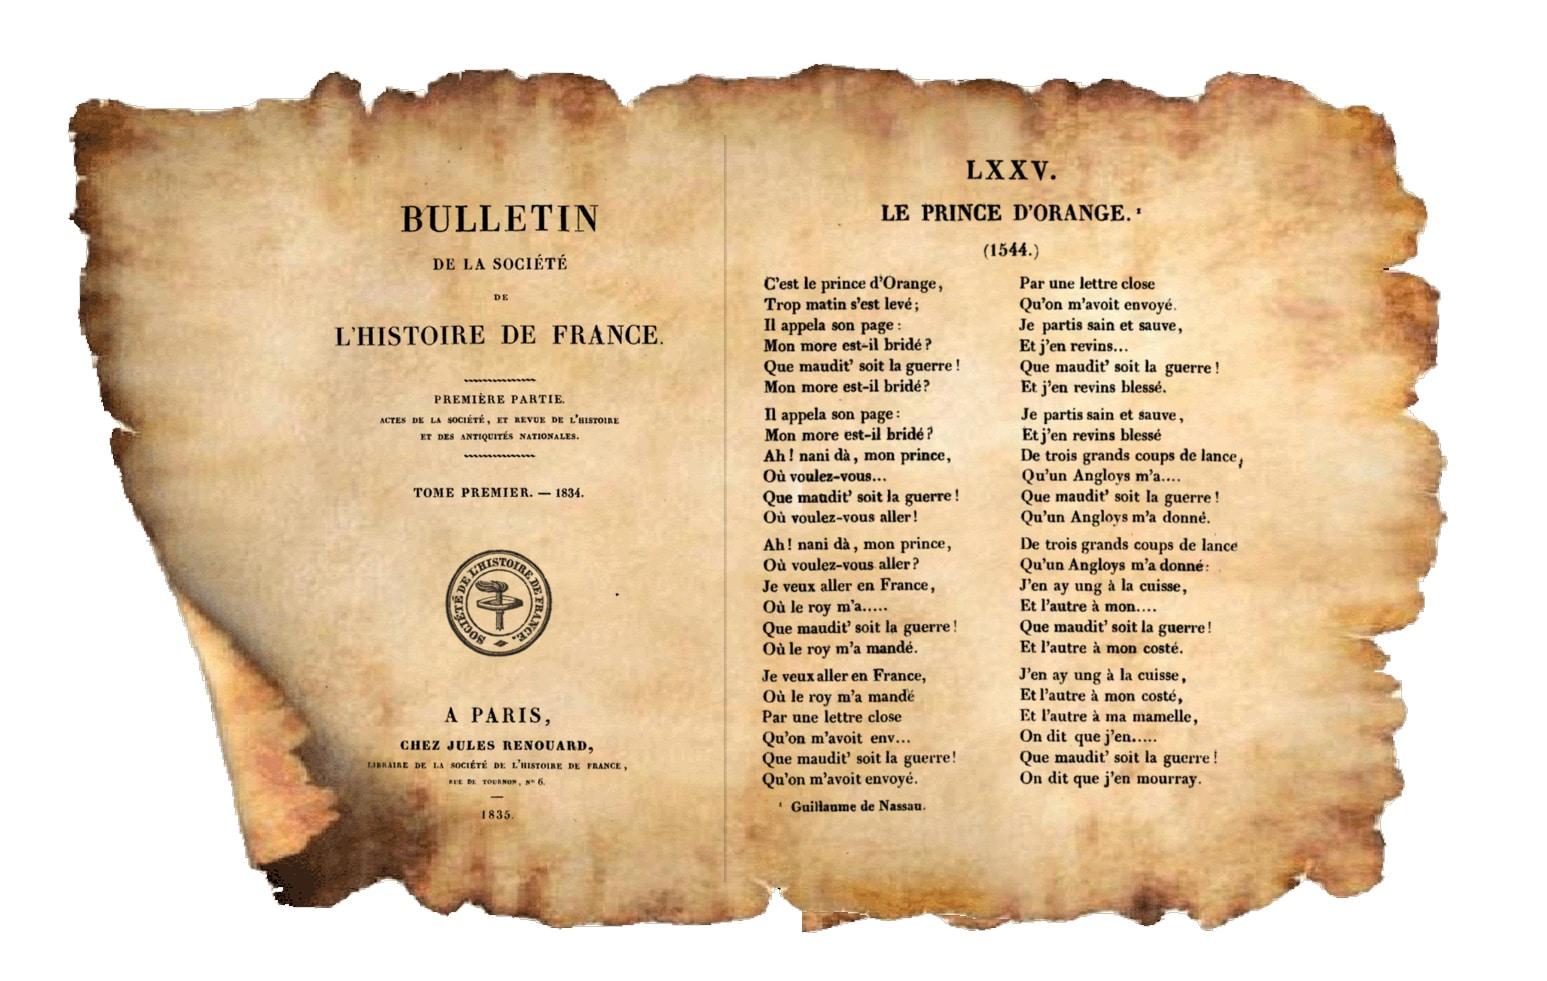 prince_orange_chanson_moyen_age_passio_troubadour_trouvere_medieval